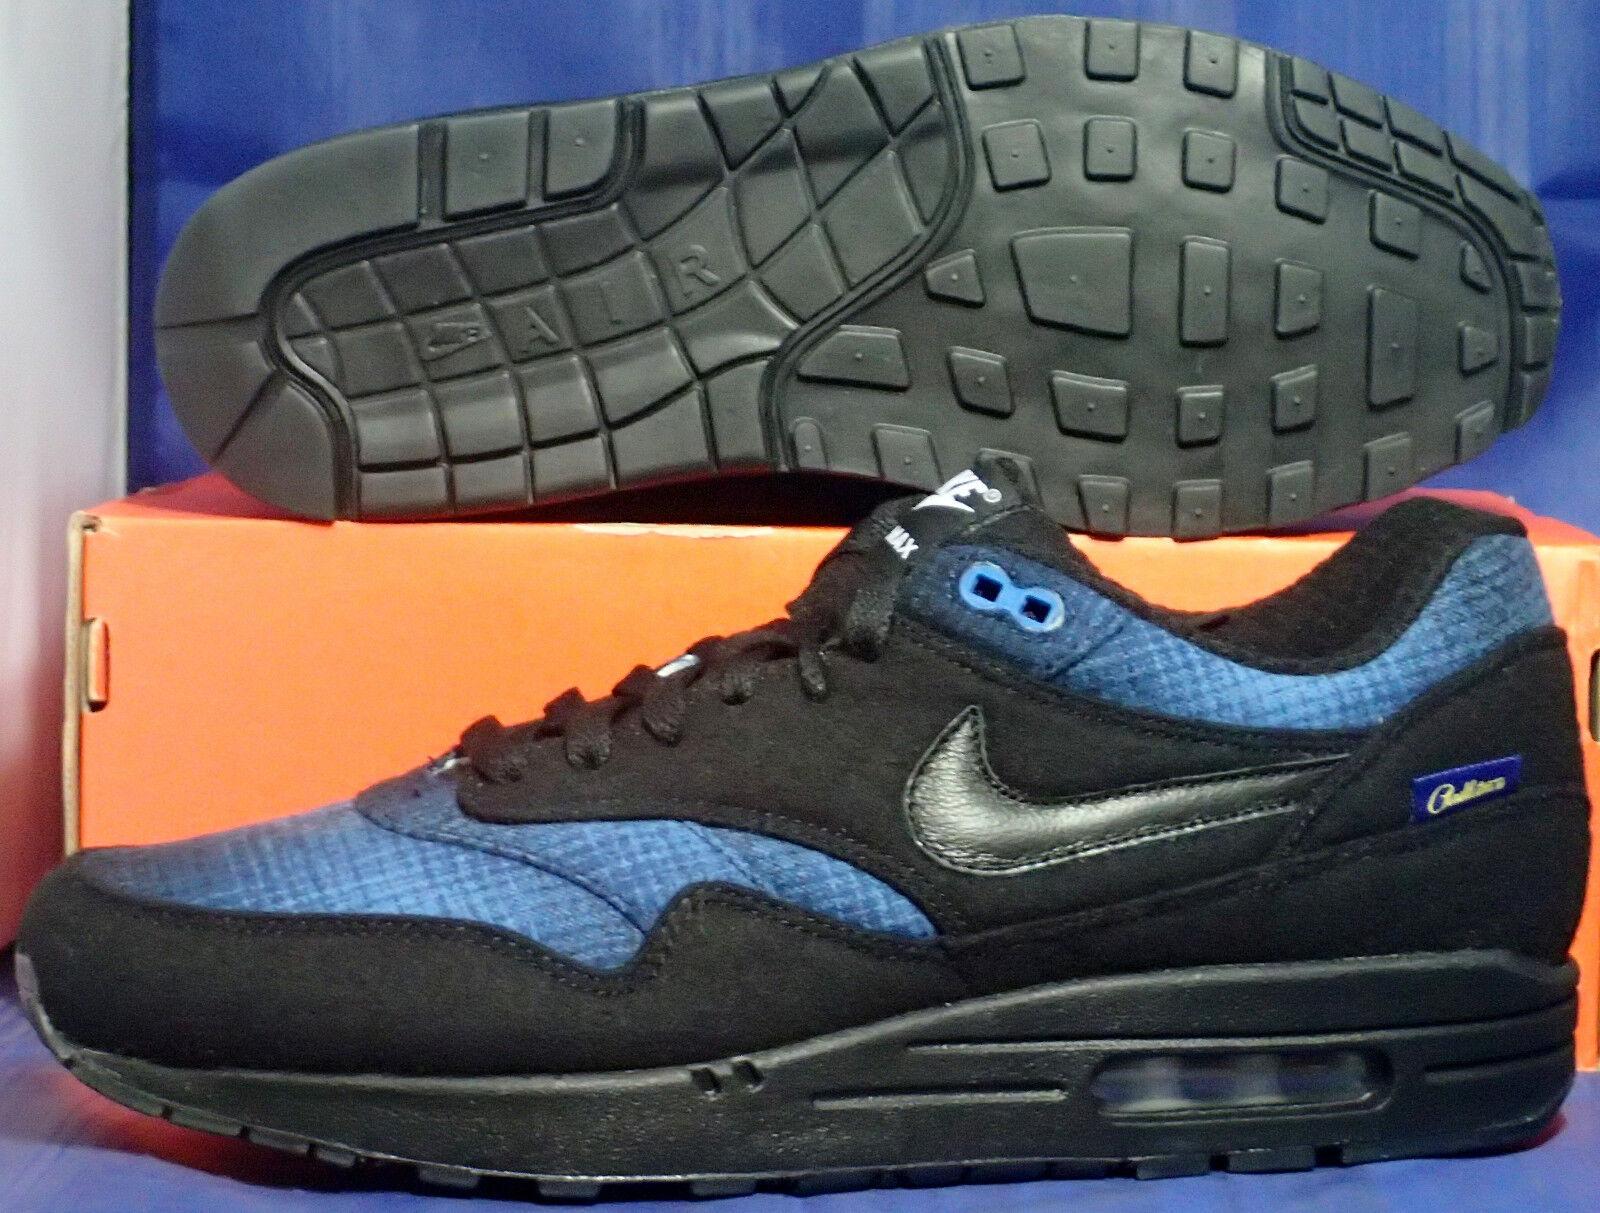 Nike Air Max Bleu 1 Premium Pendleton Id Noir Bleu Max Sz 11 744453-991 aa0fca